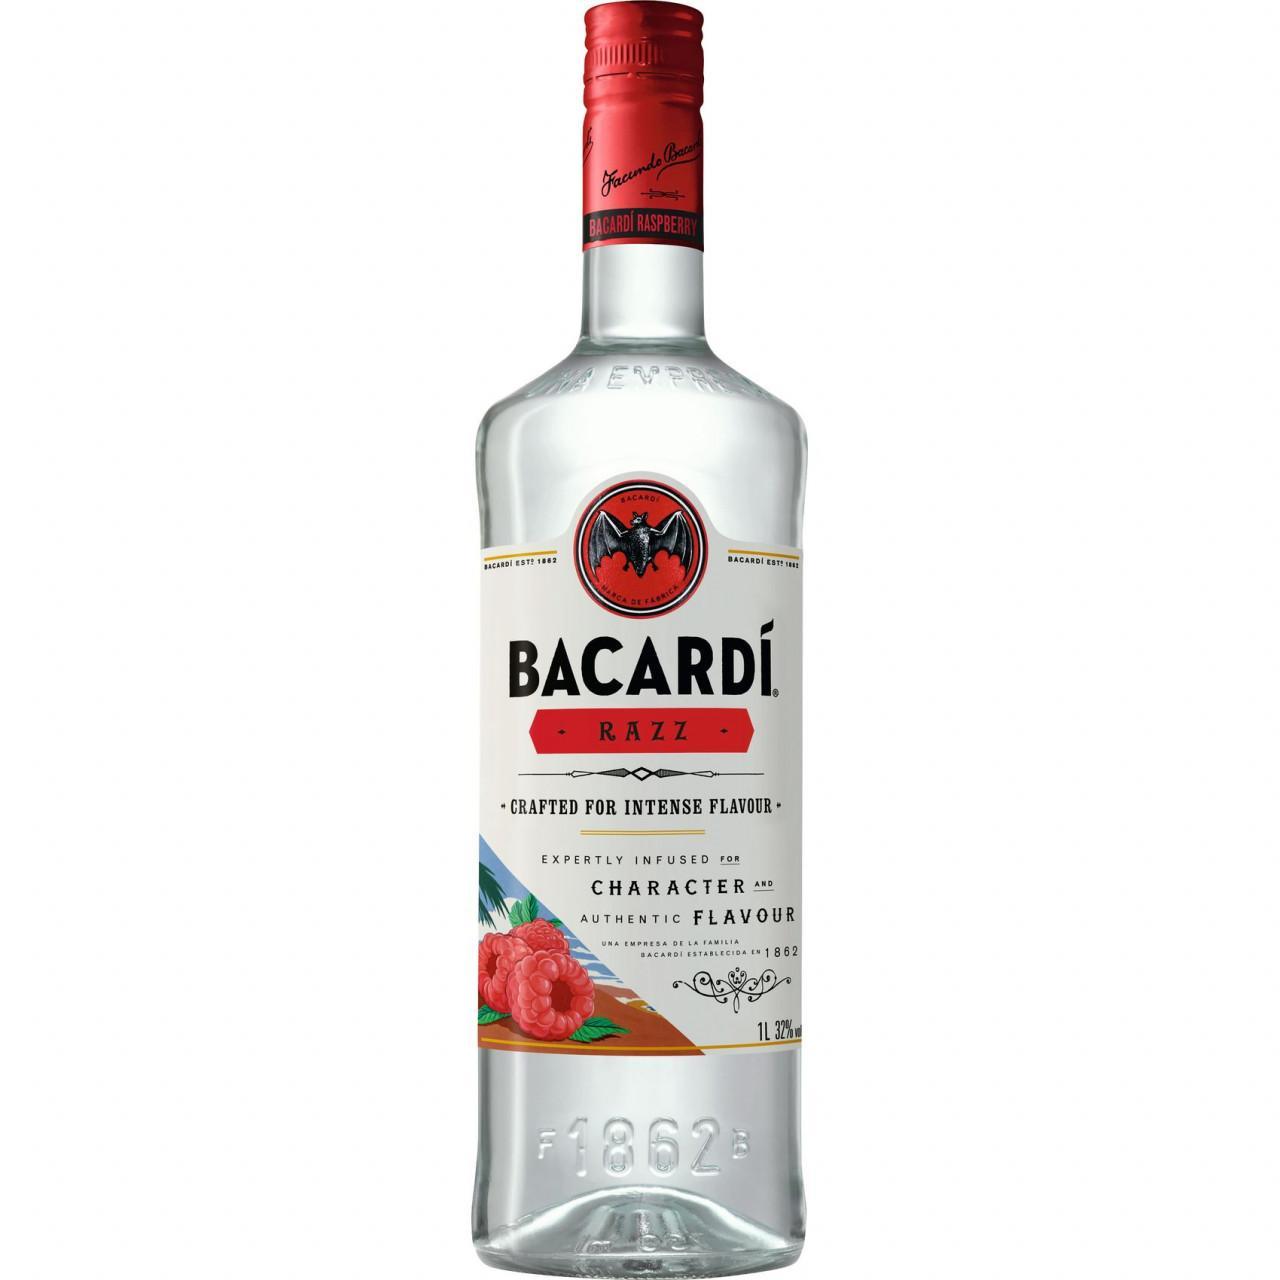 Bacardí Razz Rum 32% 1l